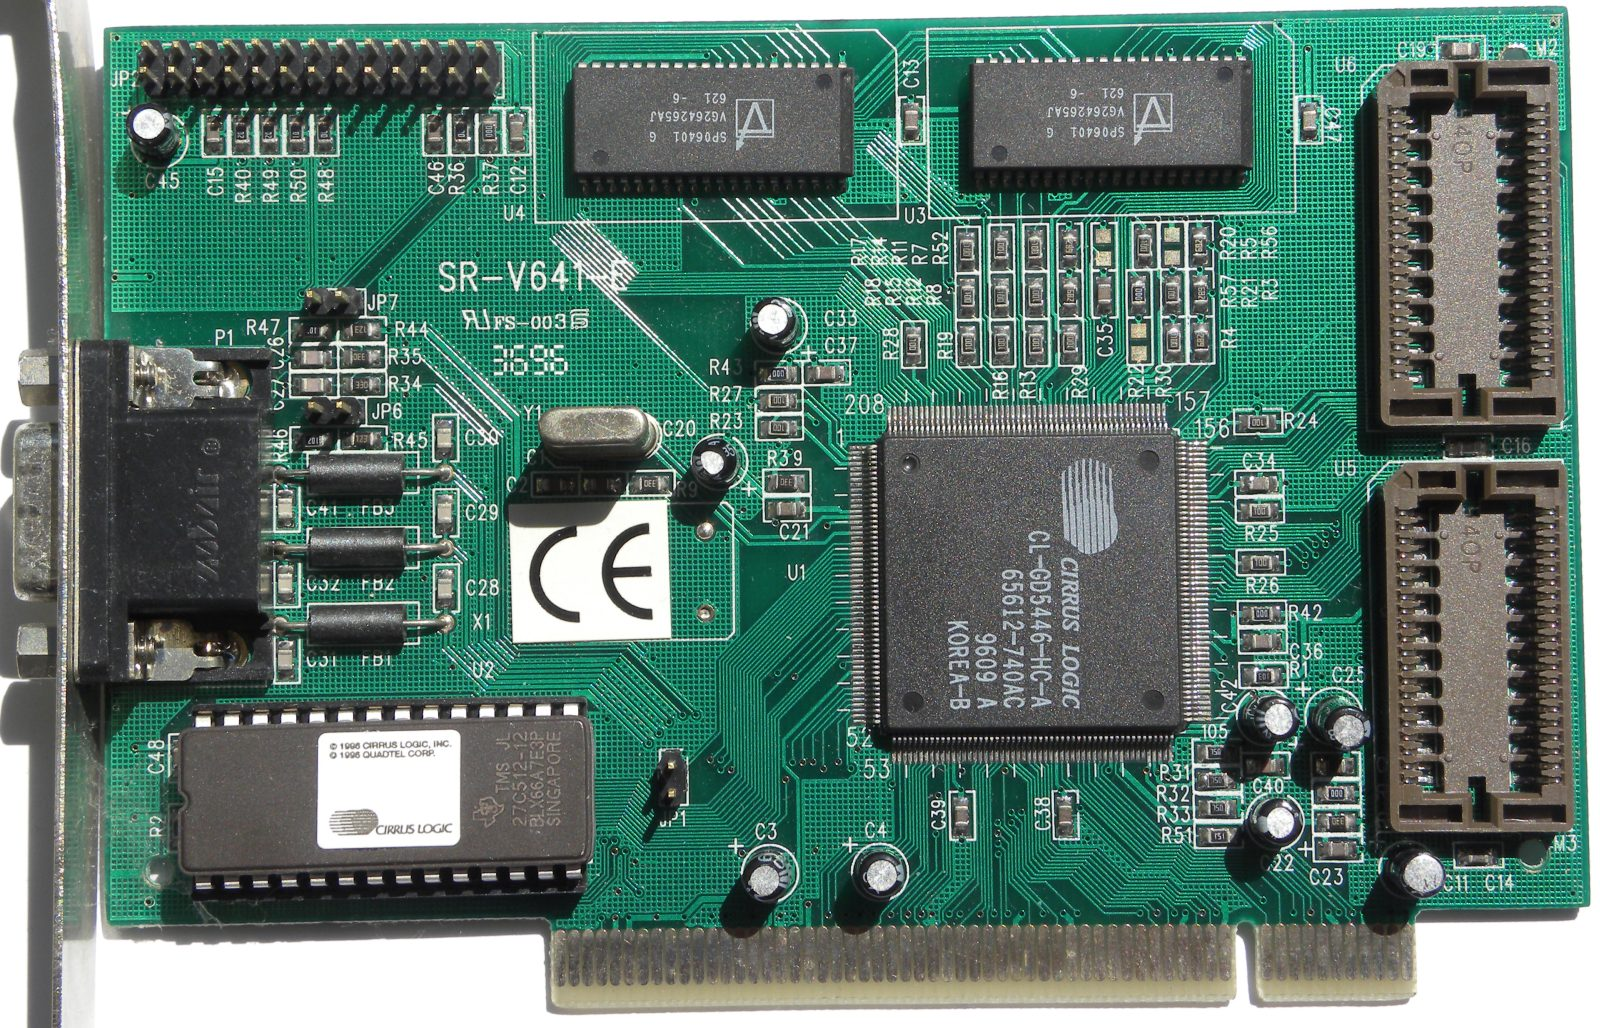 Cirrus logic 5430/40 driver